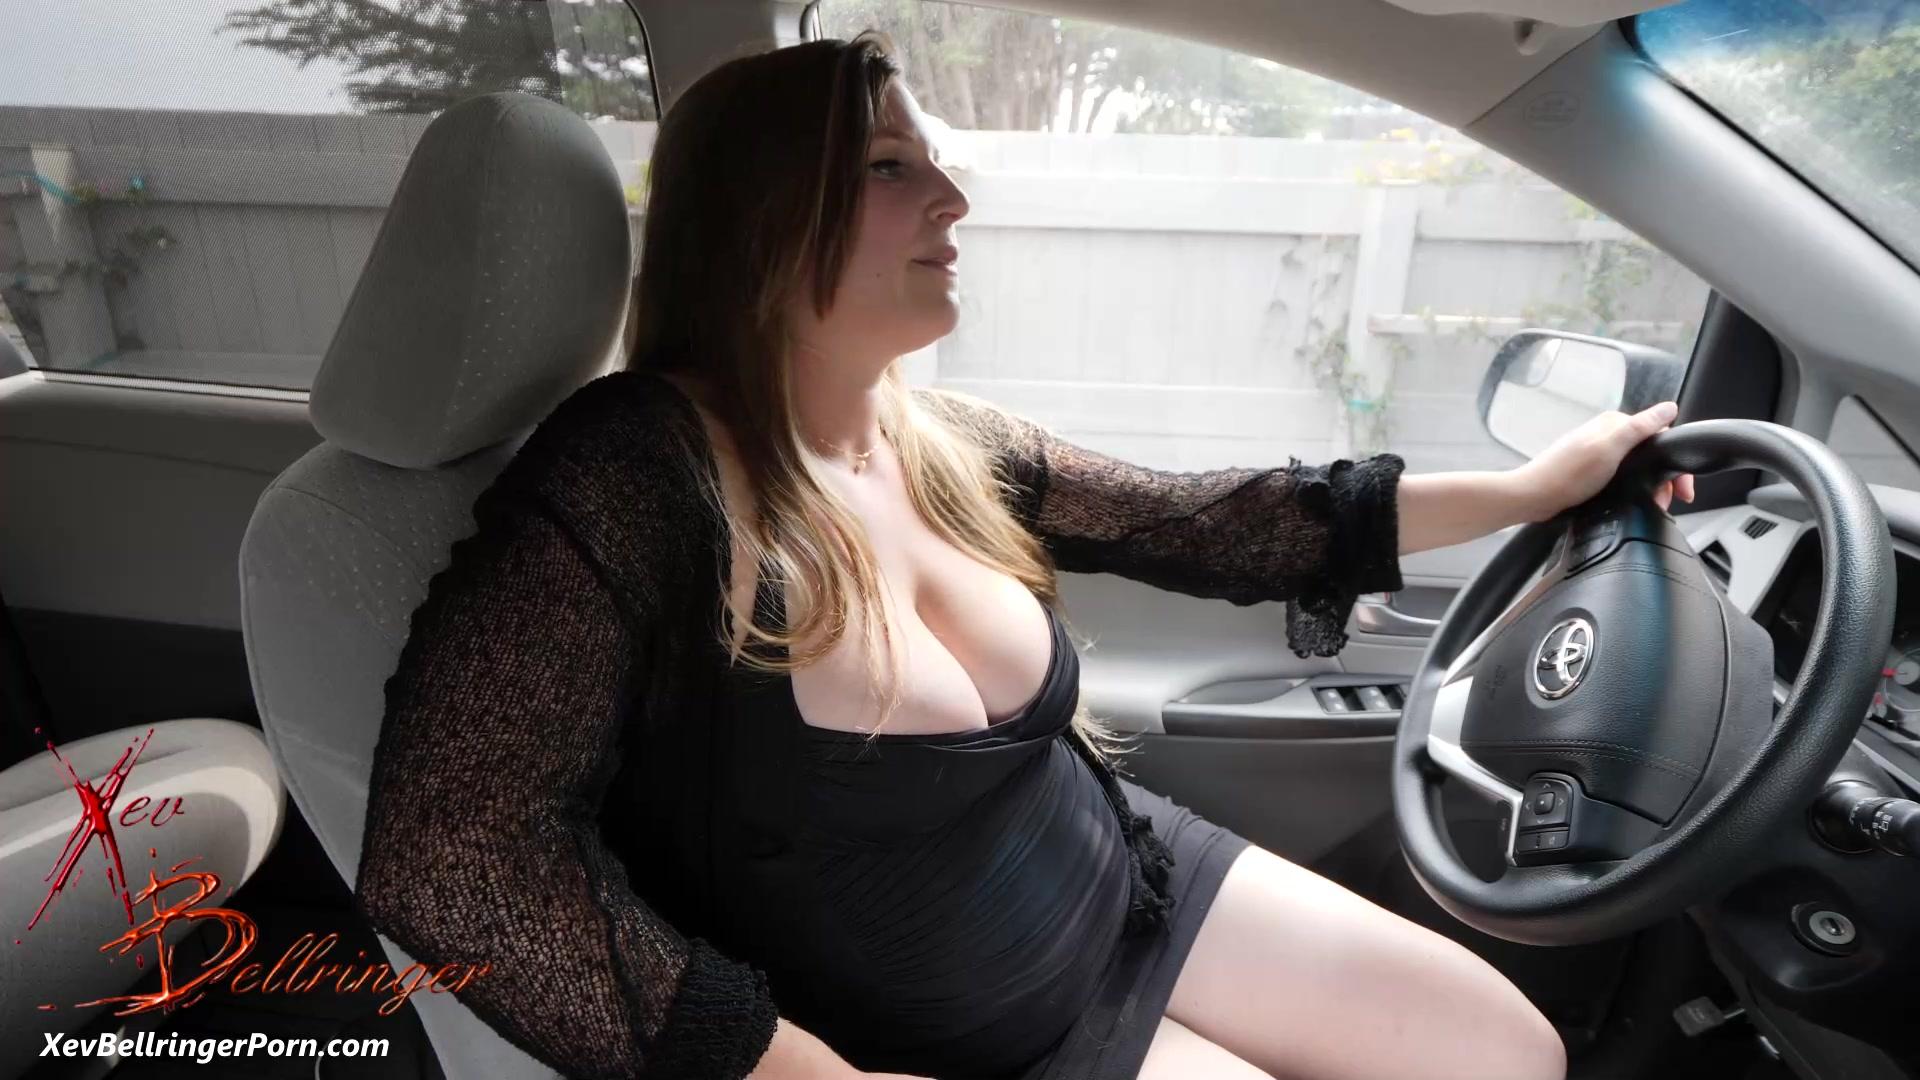 Pregnant porn bellringer xev Popular xev